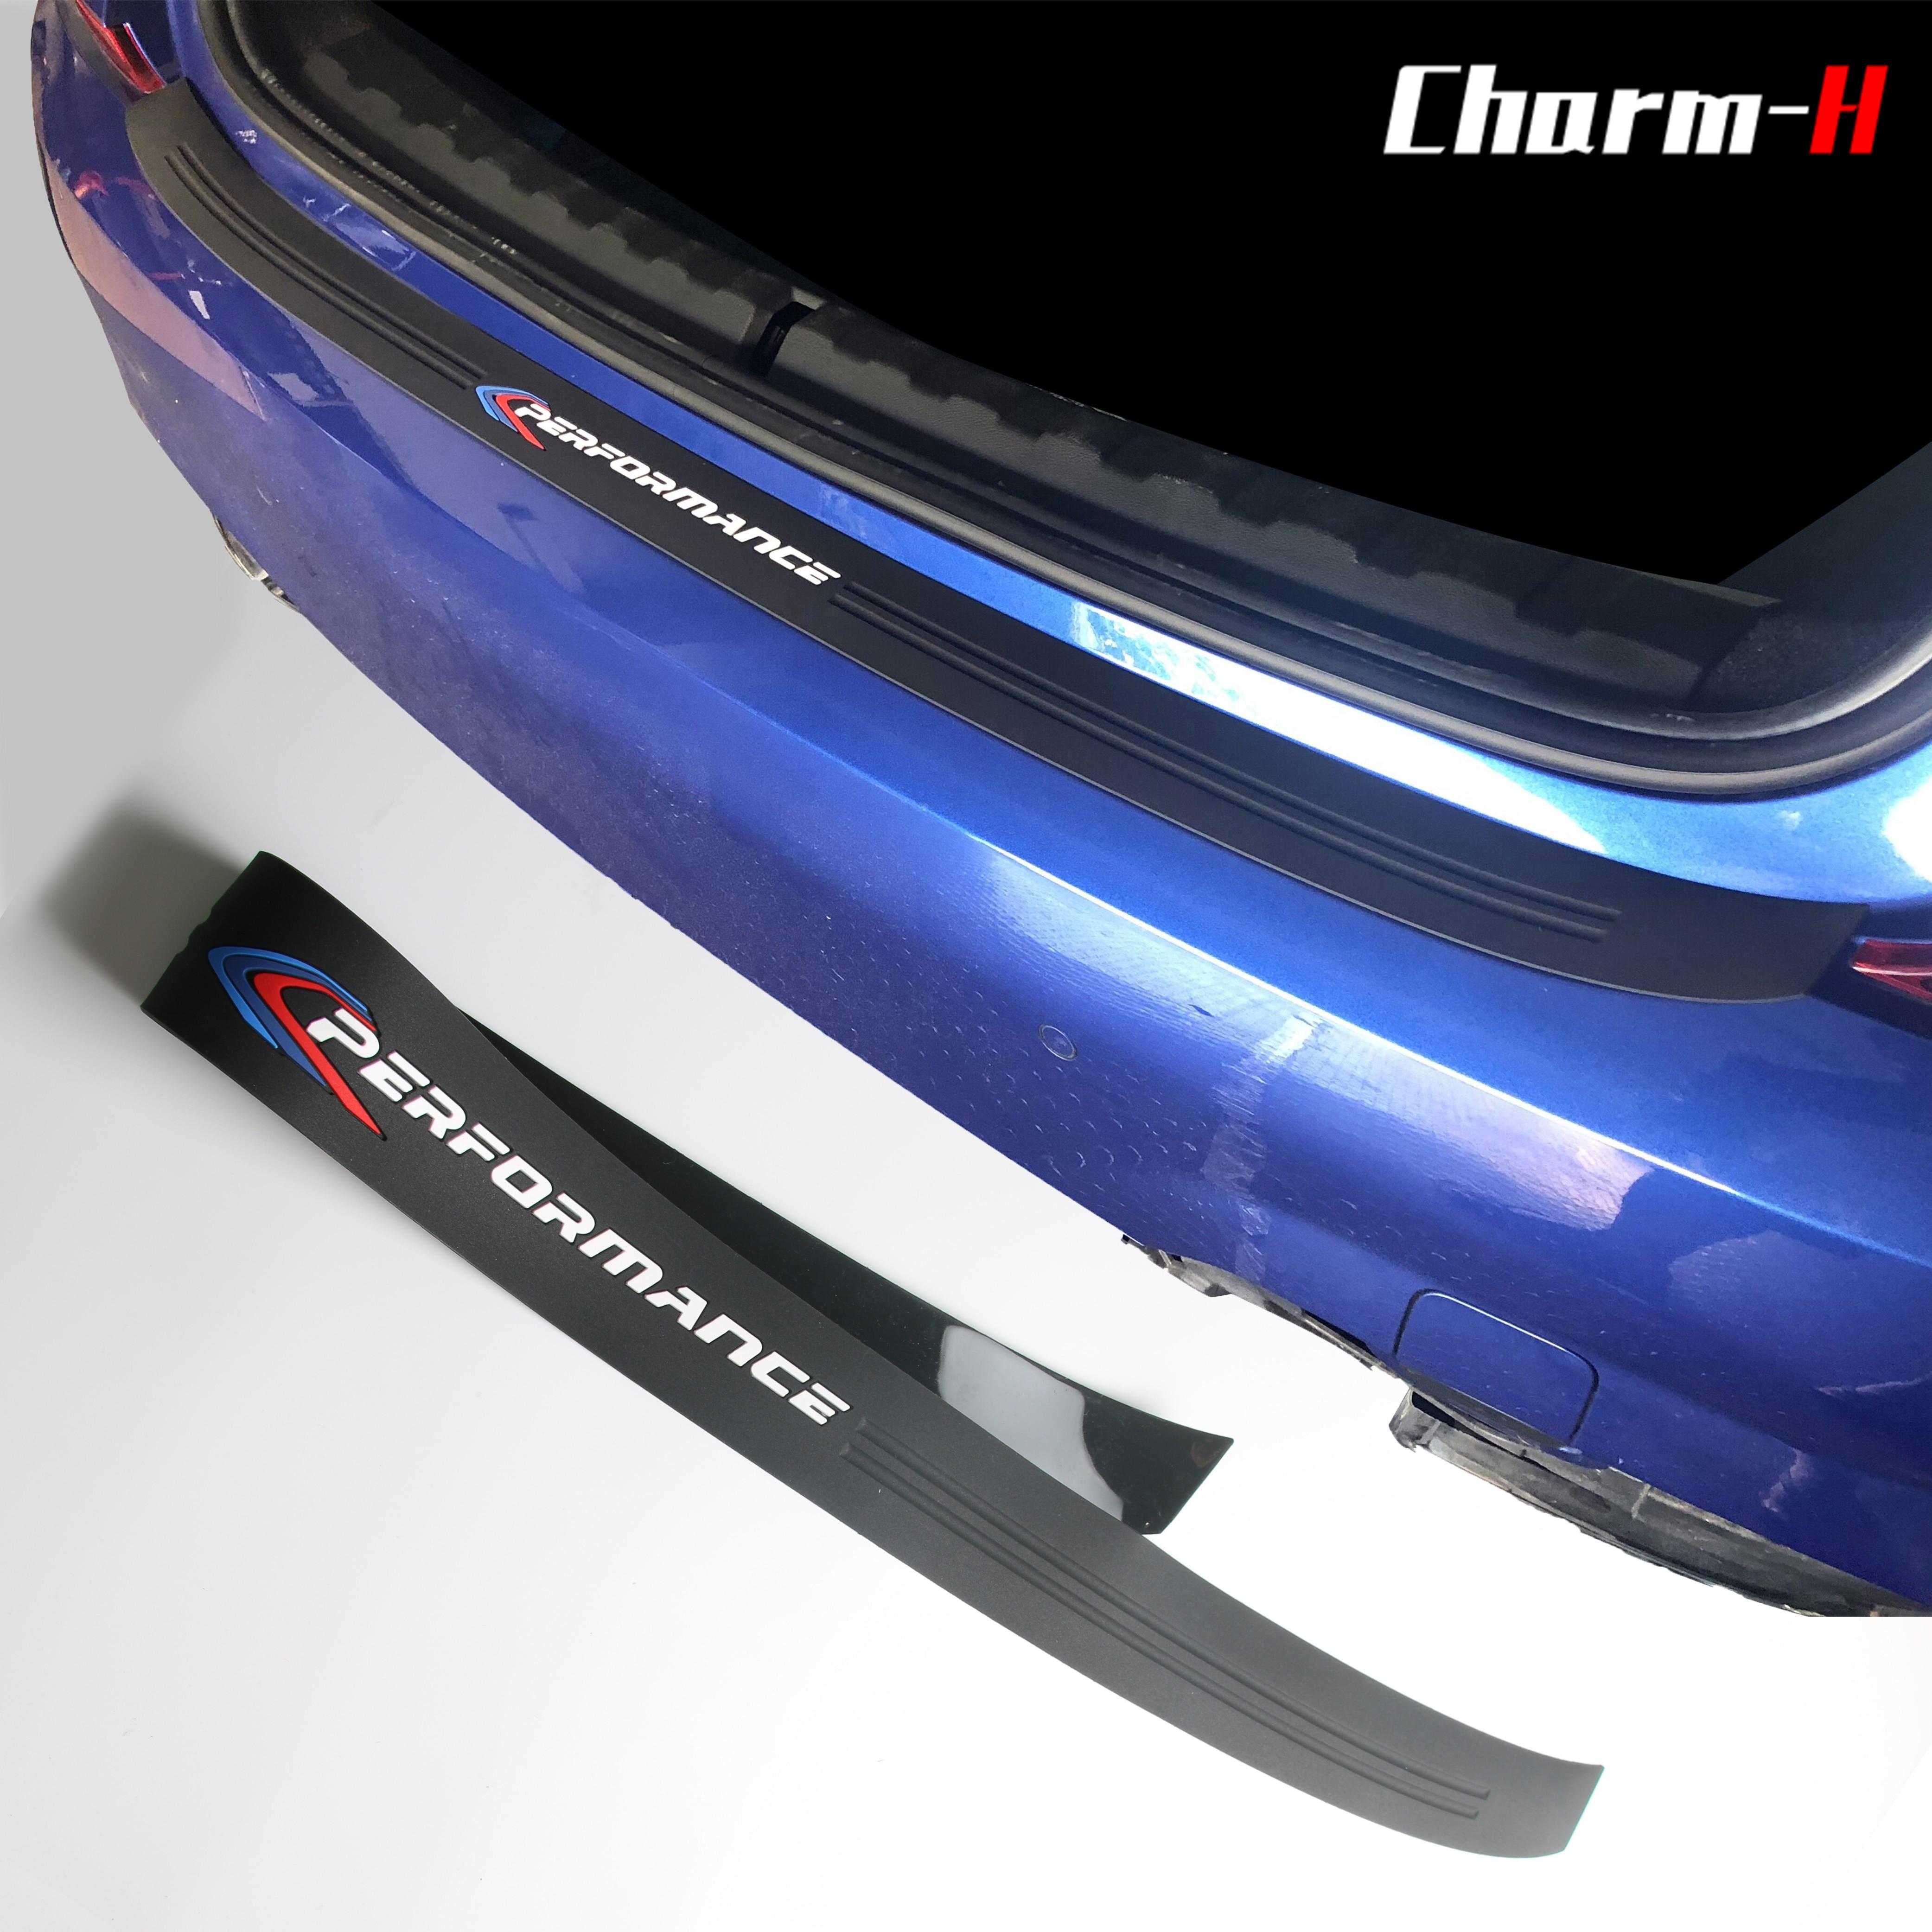 Защитная накладка на багажник автомобиля, защитная накладка на багажник, мягкая резина, защита от царапин, наклейка для BMW, 3 серии, аксессуар...